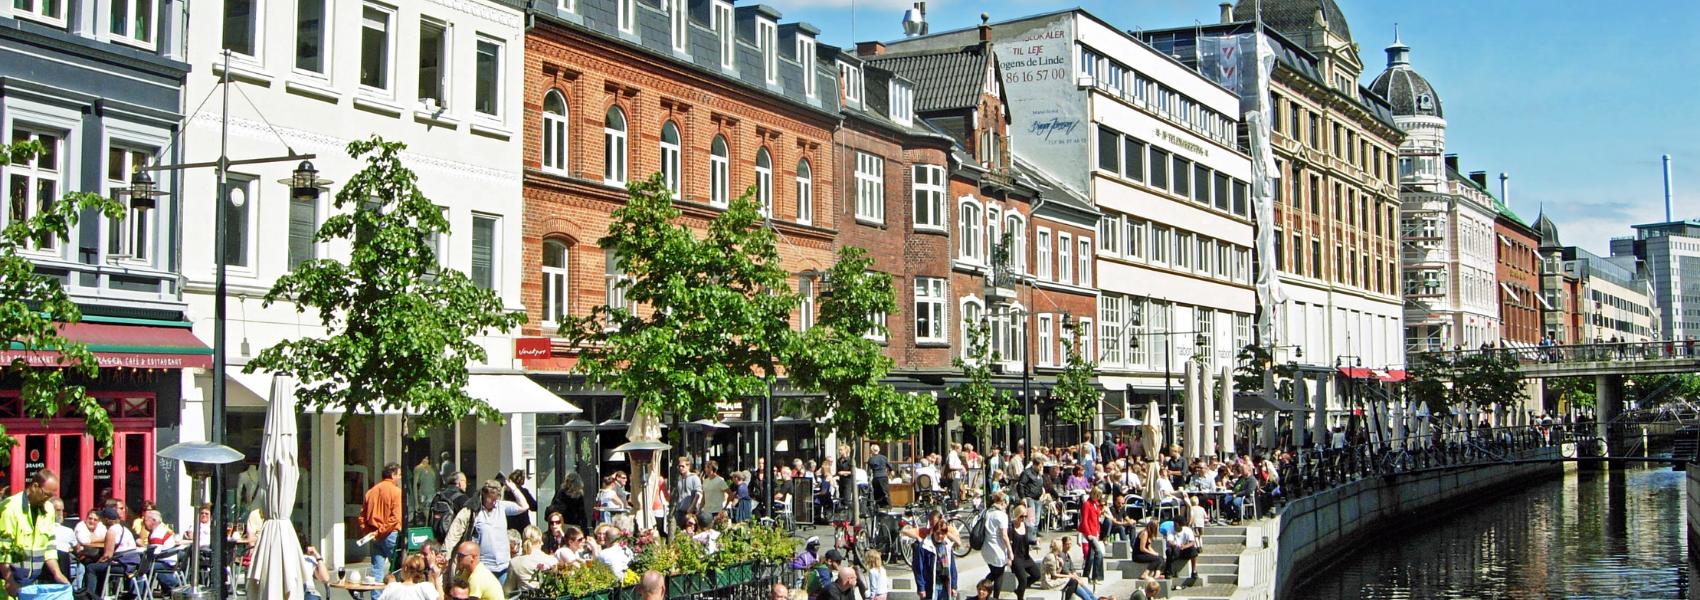 Studerende på SU: Aarhus